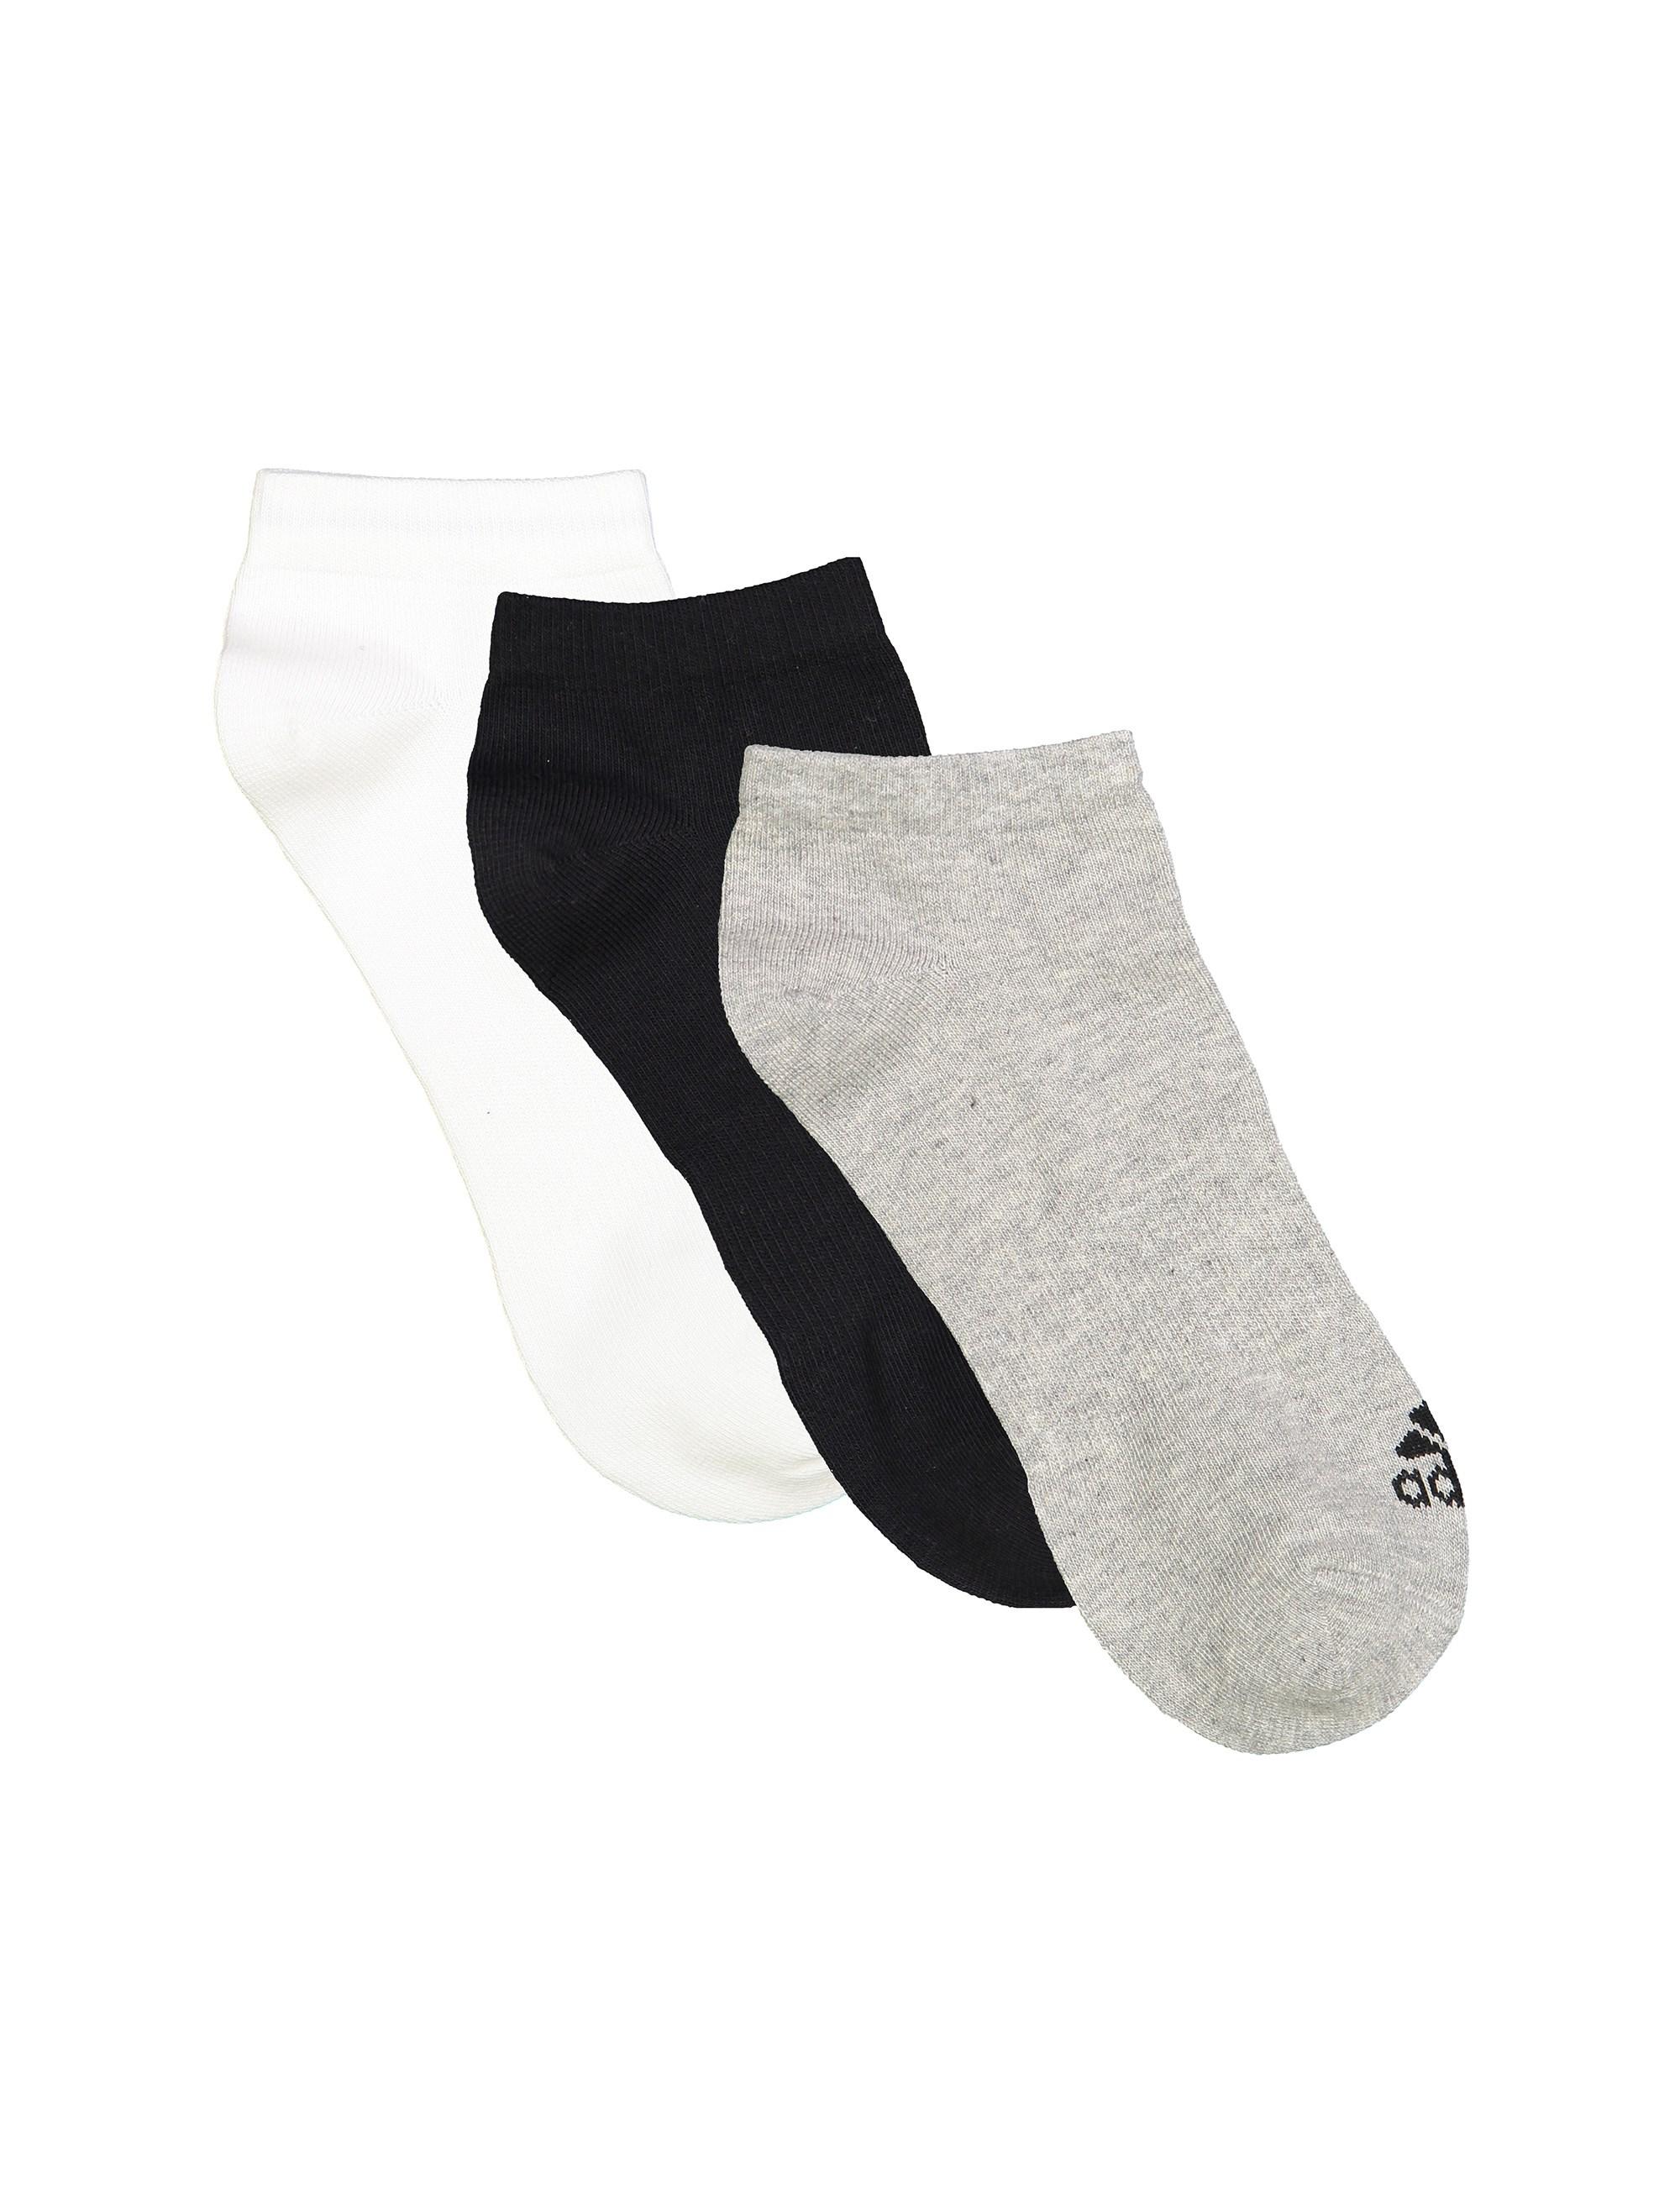 جوراب ساق کوتاه بزرگسال بسته 3 عددی